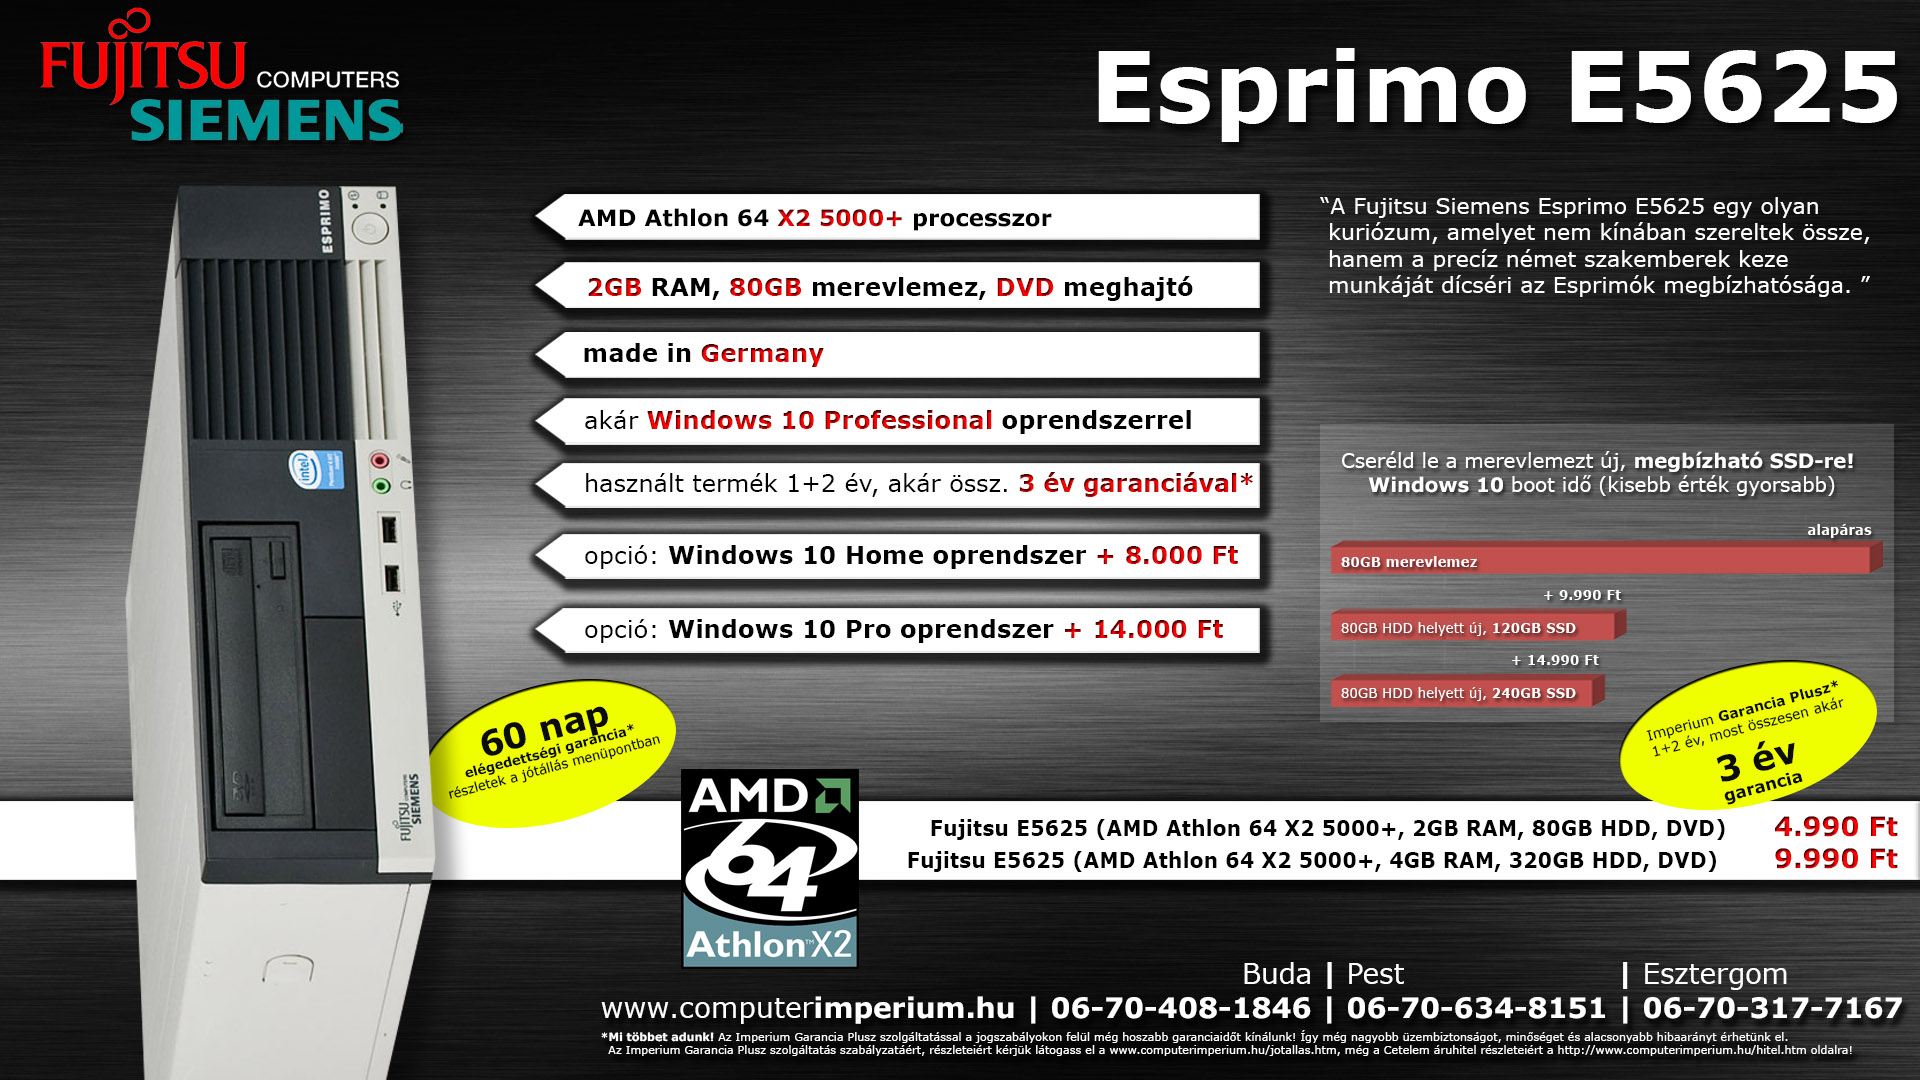 82db417069 SFF - FSC E5625 (AMD Athlon 64 X2 5000+, 2GB RAM, 80GB HDD, DVD), 73 950,  10+, 7 990 Ft